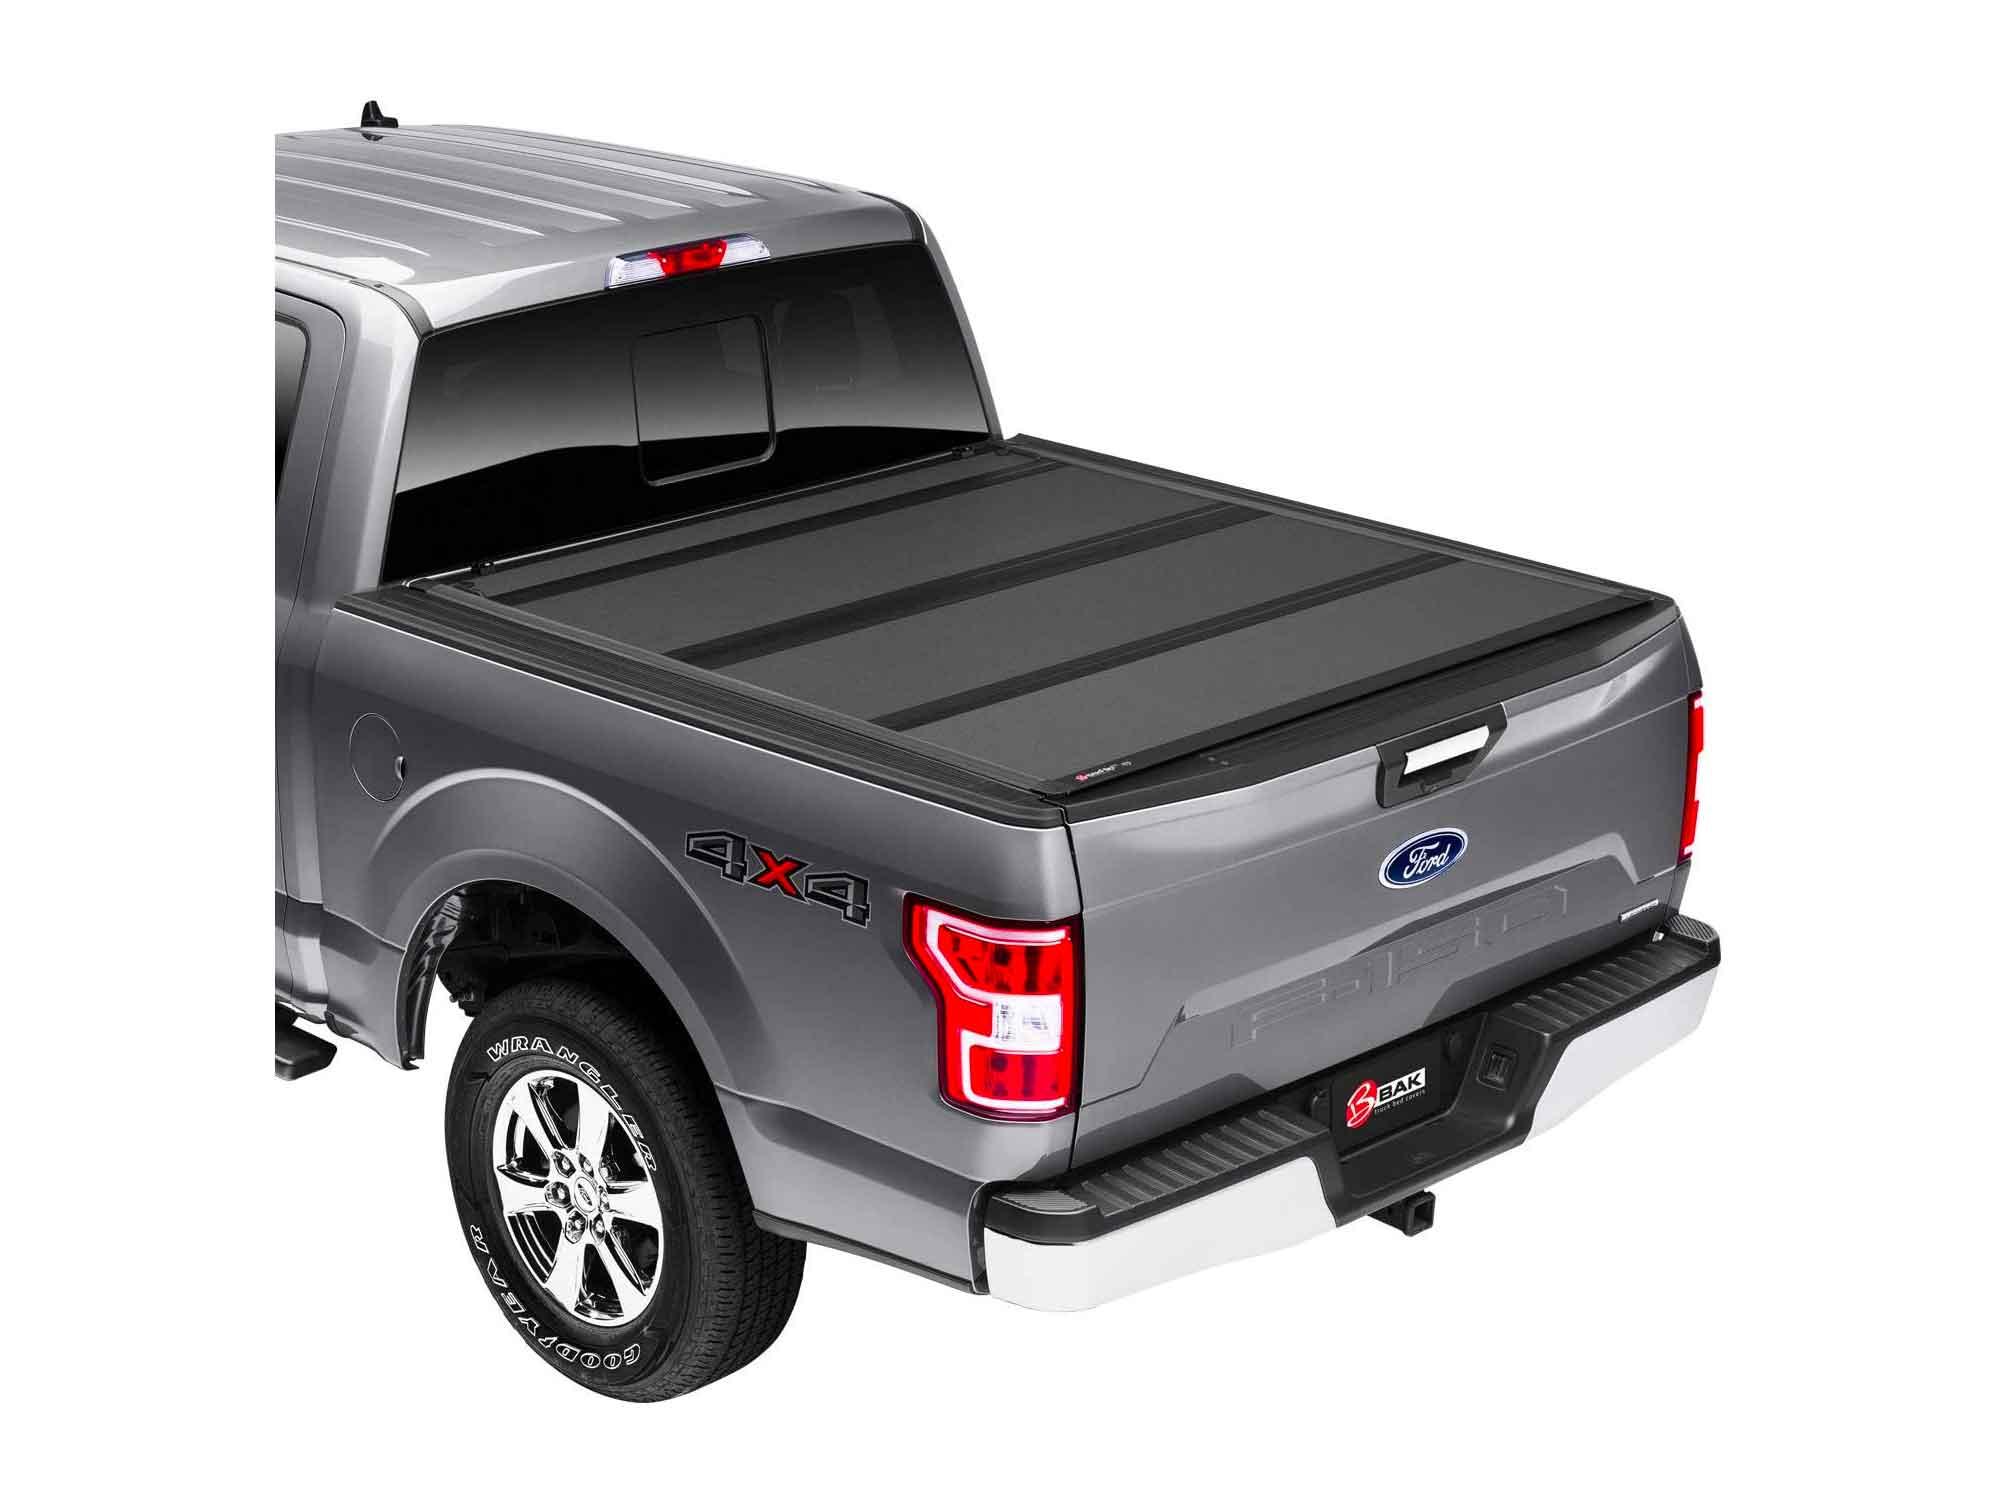 BAK BAKFlip MX4 Hard Folding Truck Bed Tonneau Cover   Fits 2015 - 2020 Ford F150 5' 7